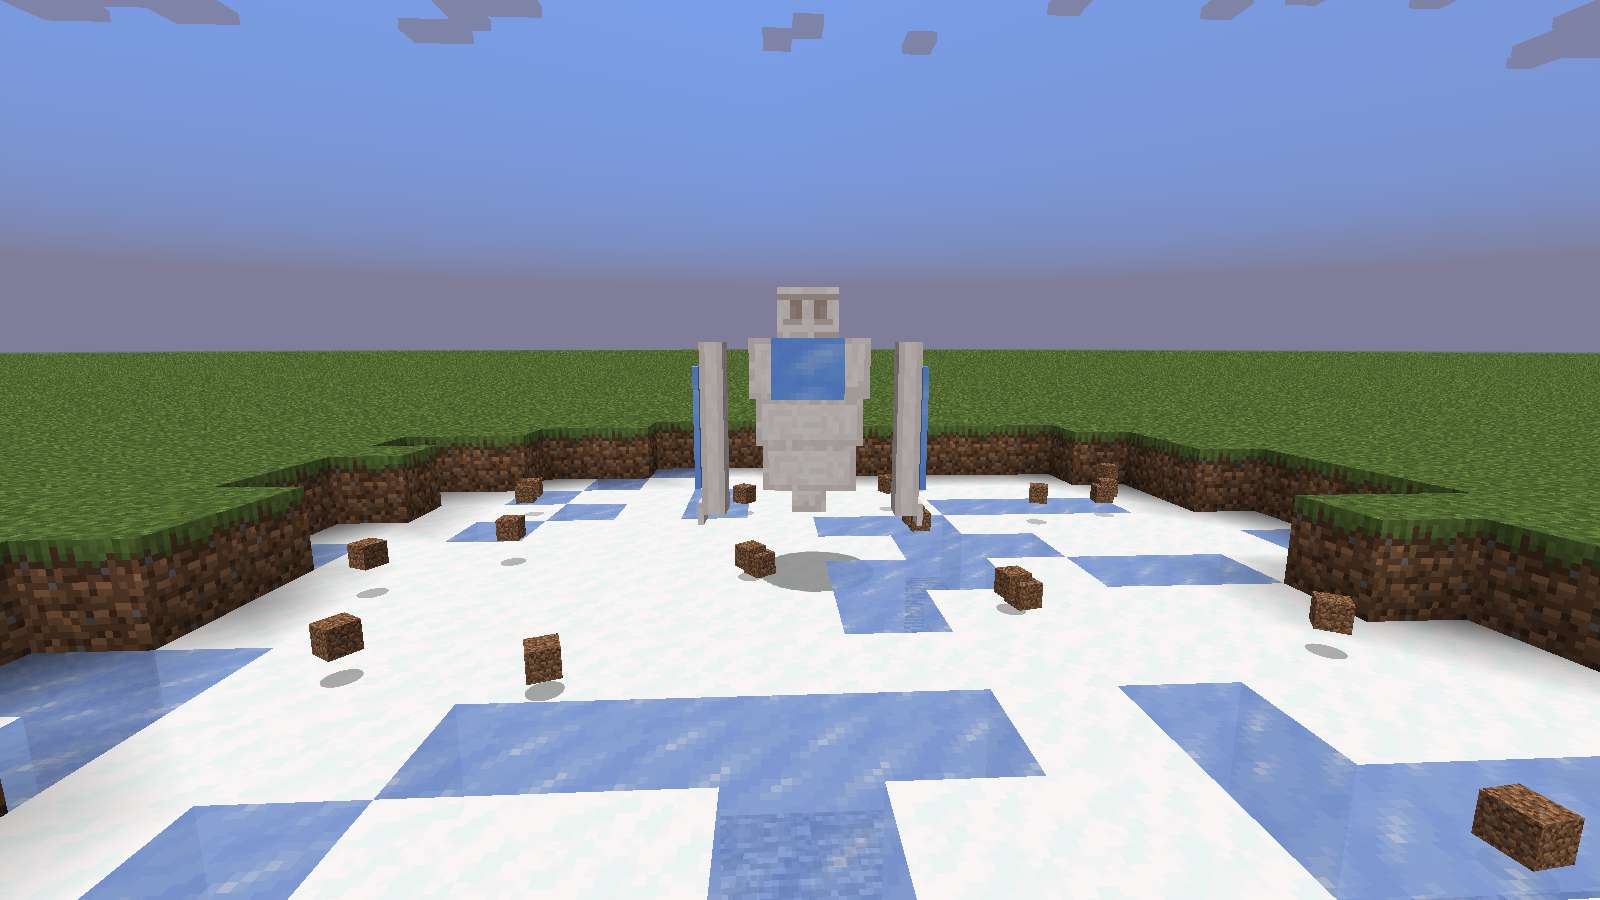 Fimbulwinter mod for minecraft 21